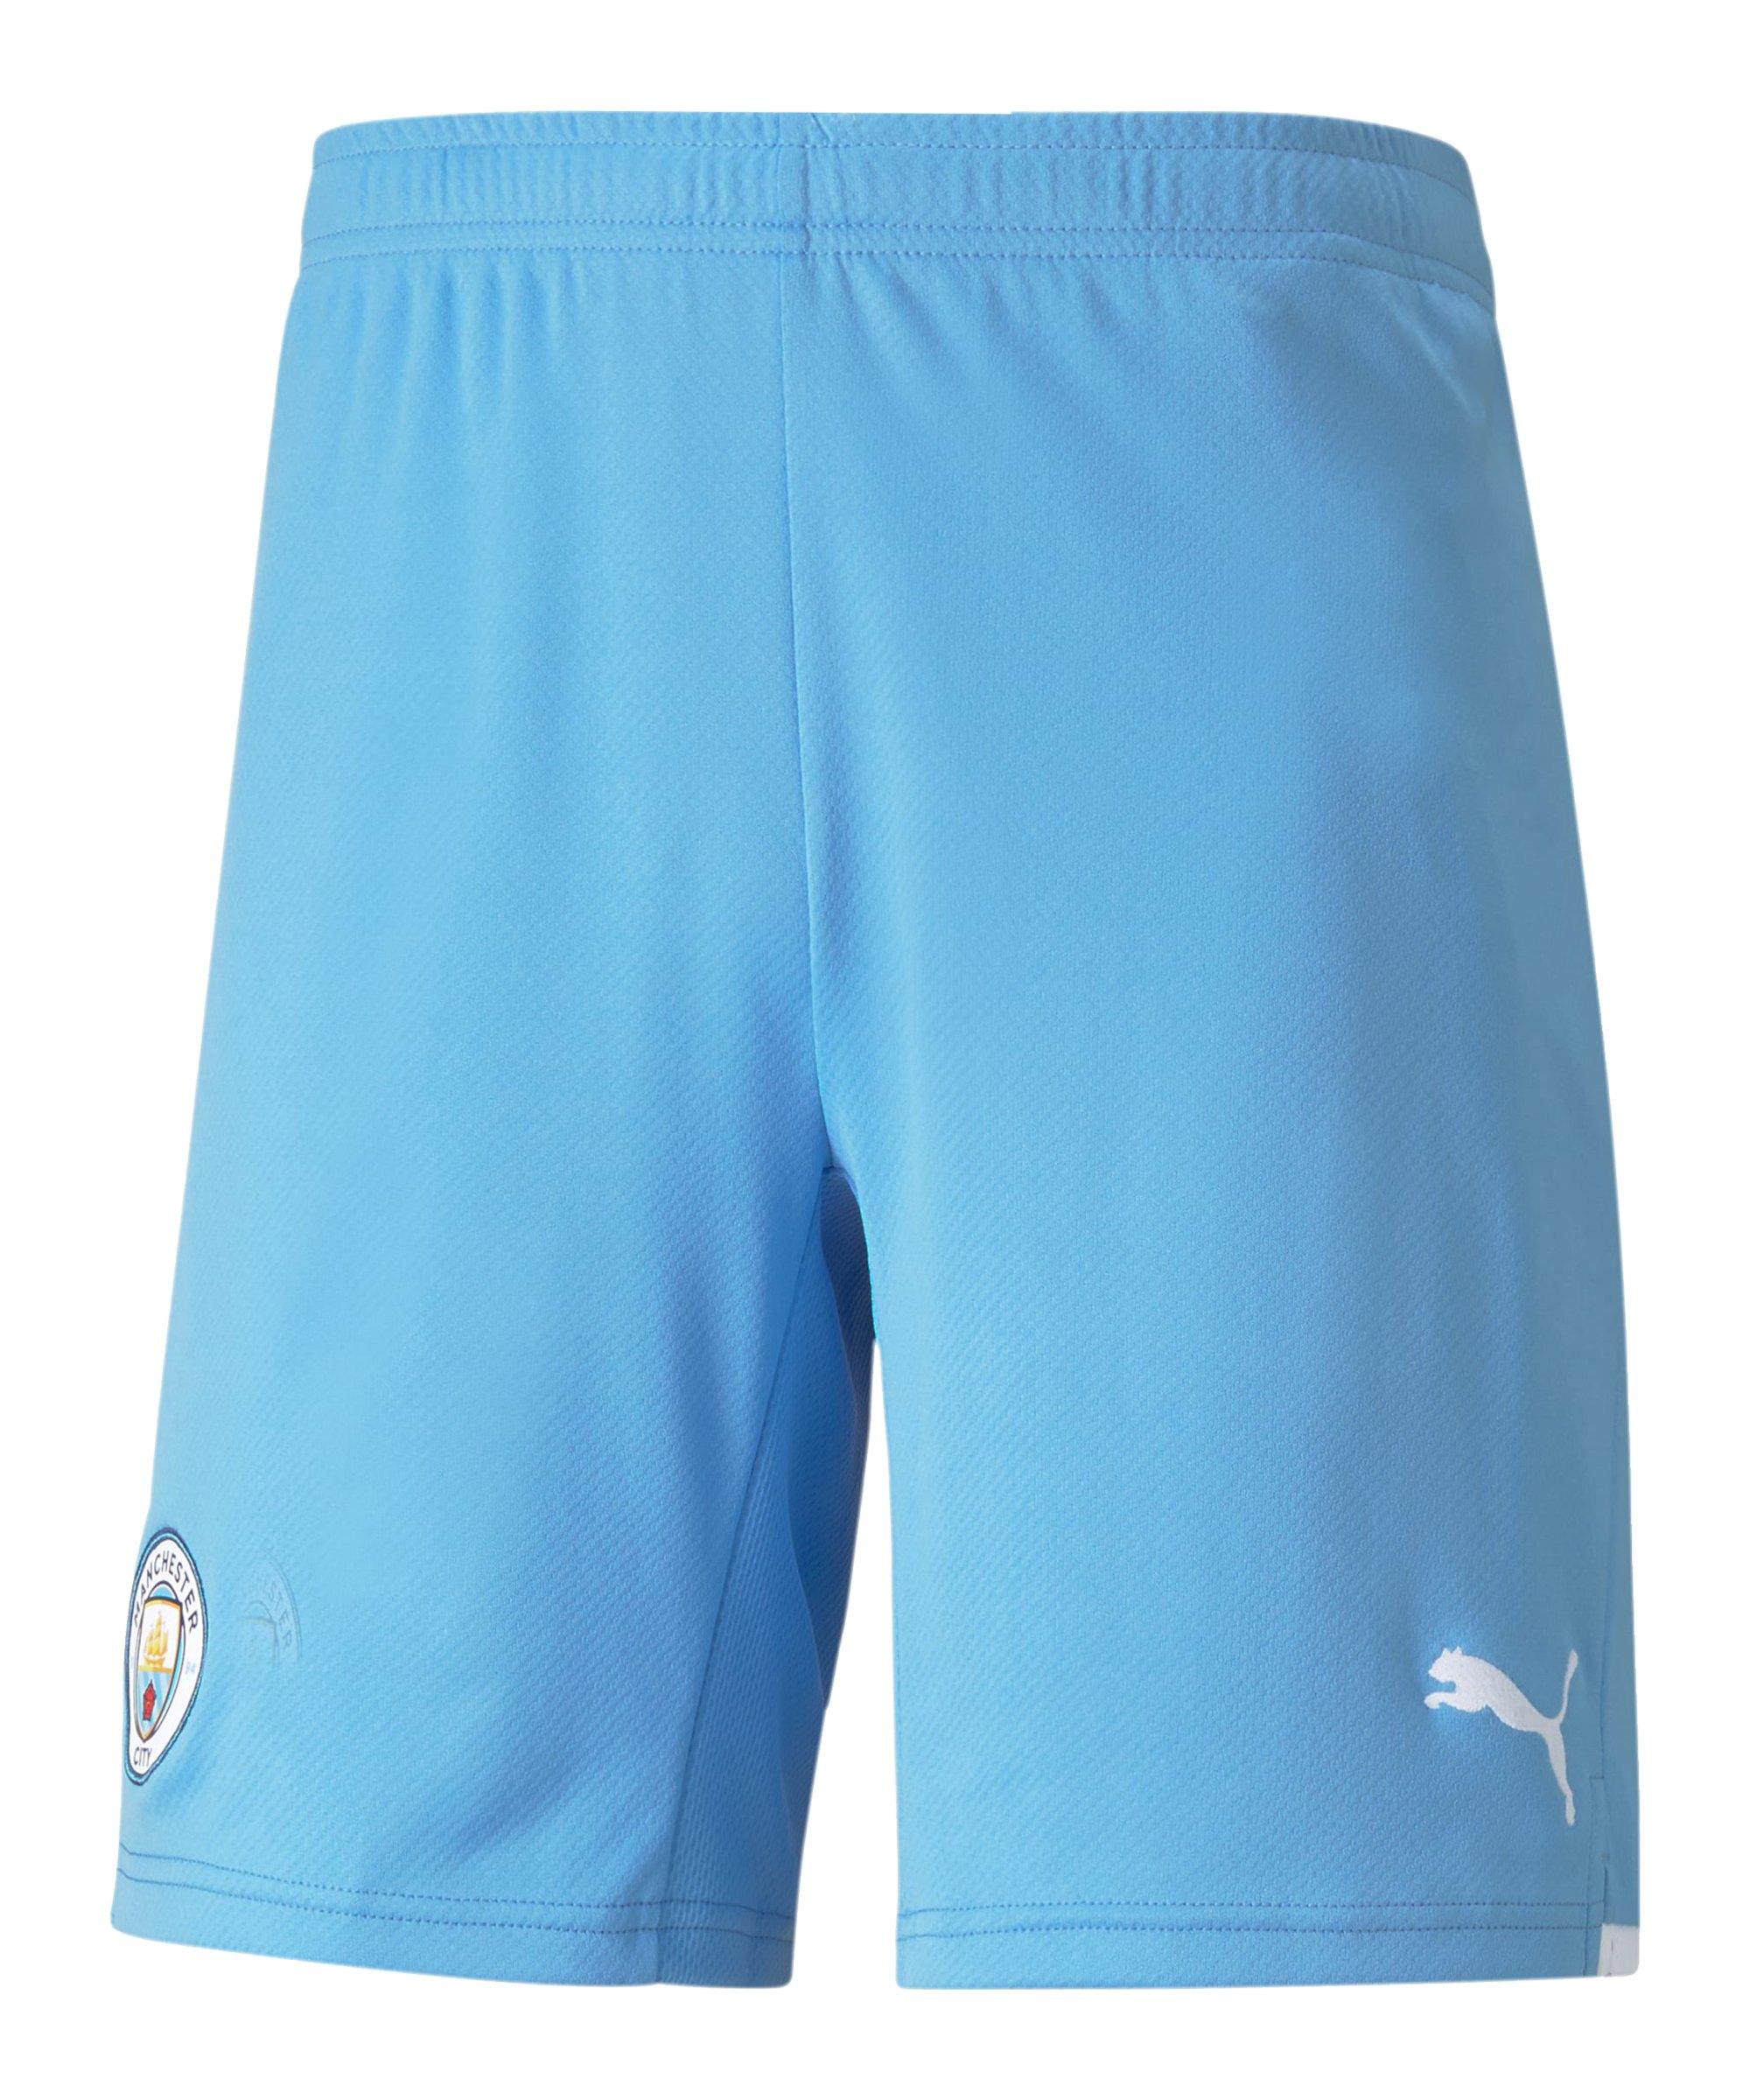 PUMA Manchester City Short Home 2021/2022 Blau F01 - blau